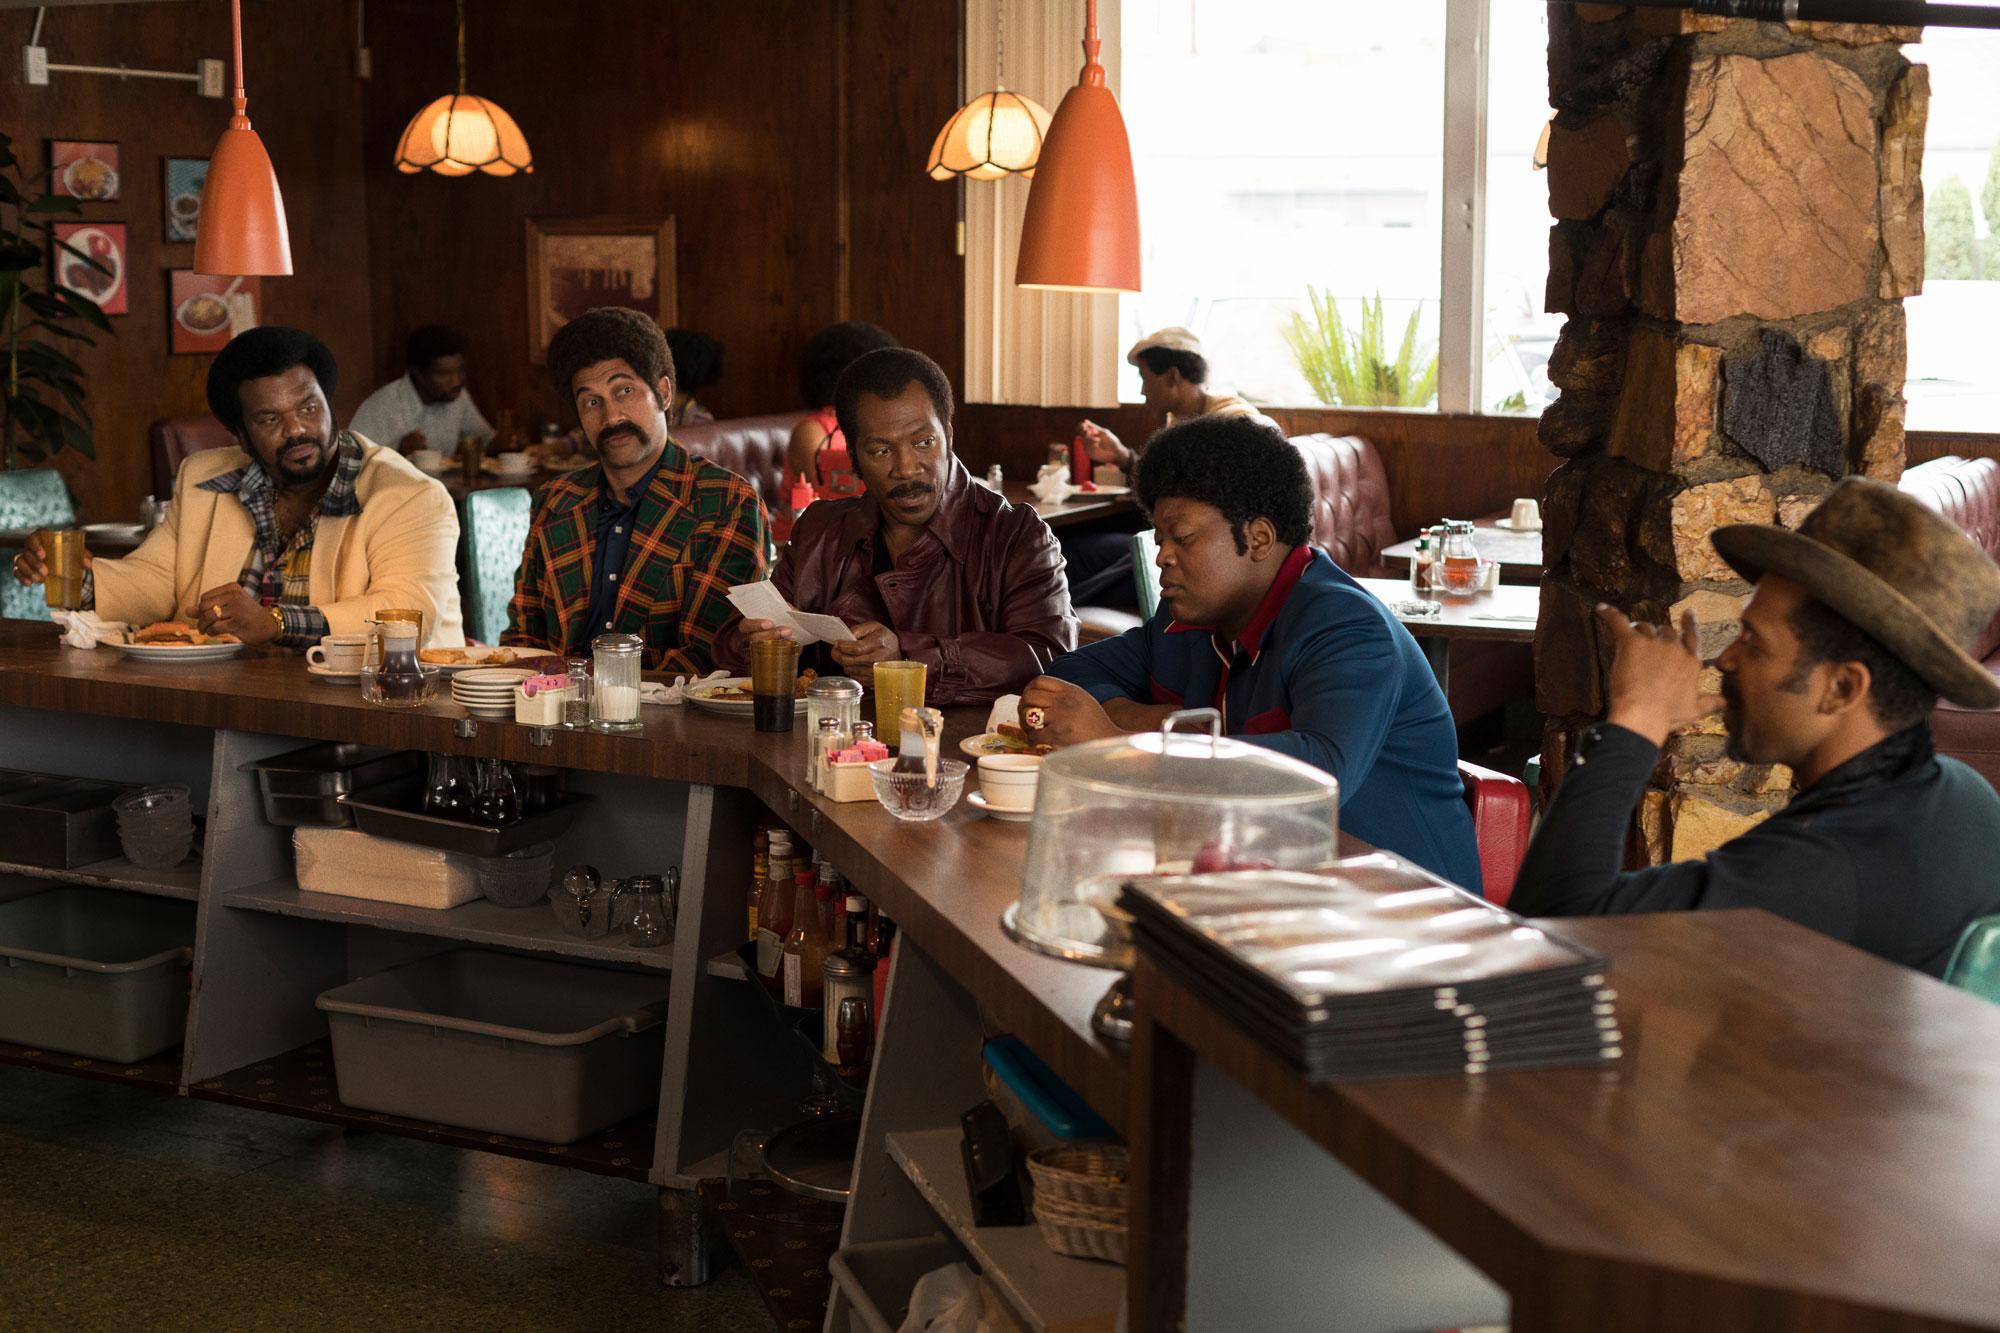 'Dolemite Is My Name': Peter Travers Reviews Eddie Murphy Movie – Rolling Stone